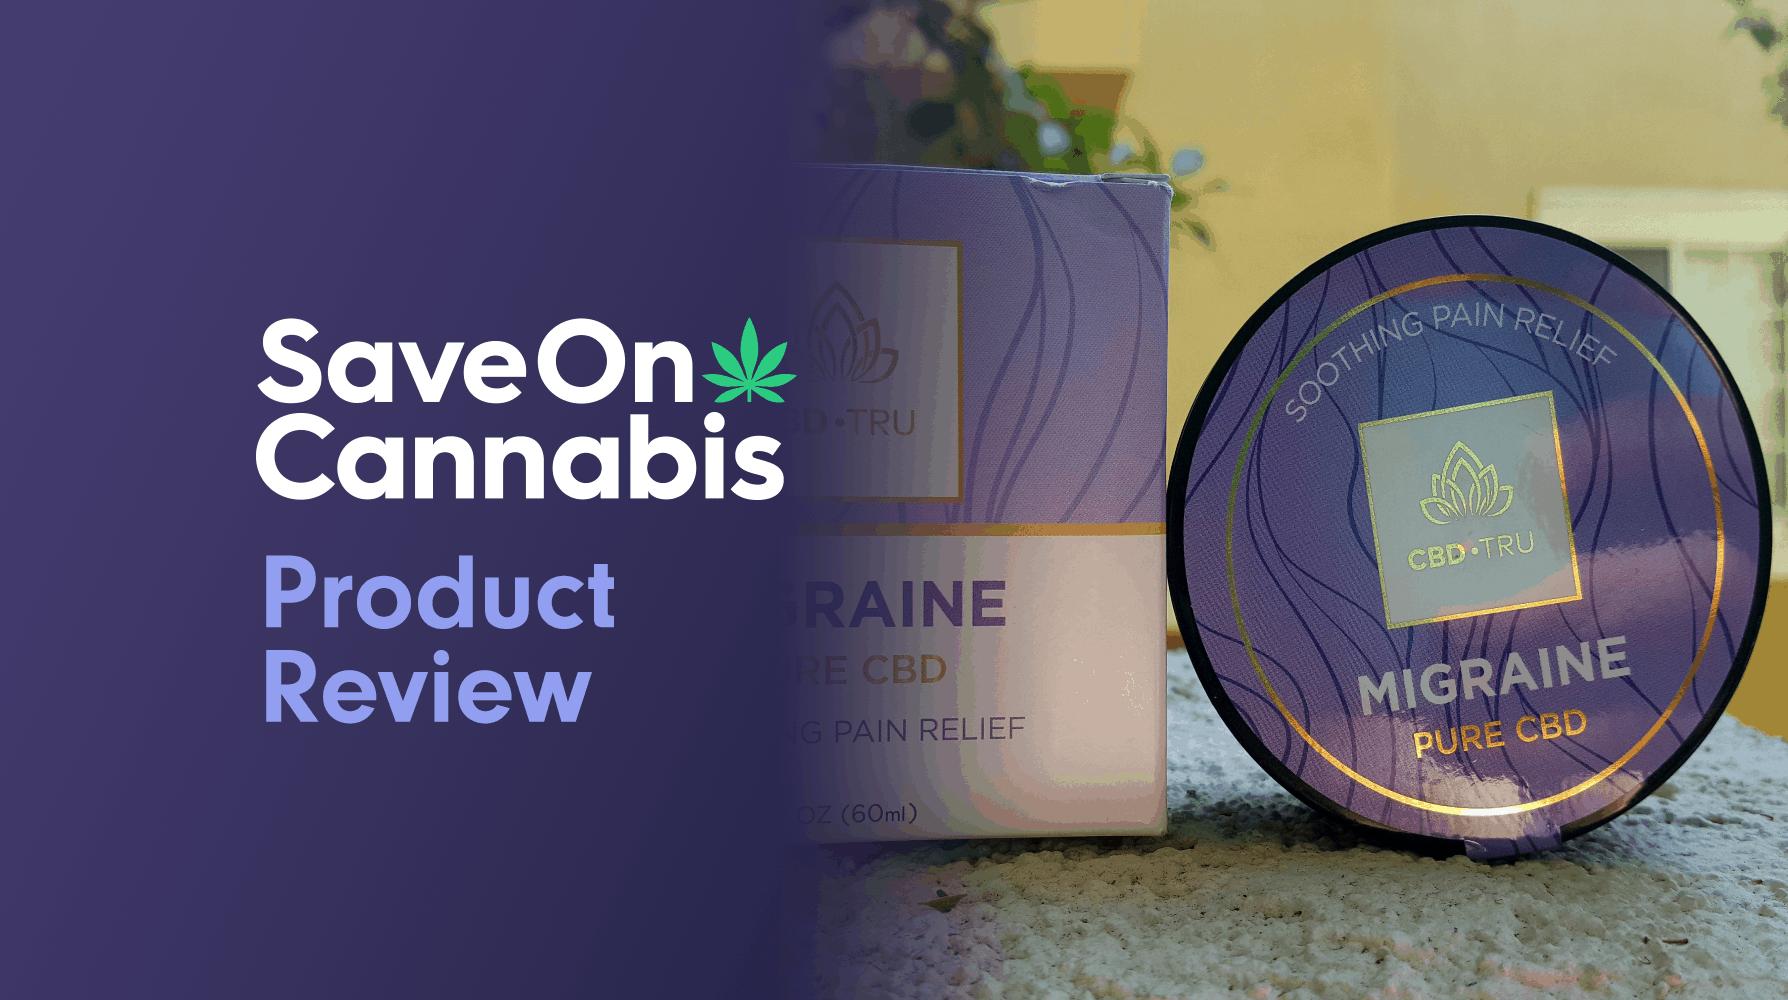 CBD Tru Review Migraine Salve Save On Cannabis Webiste